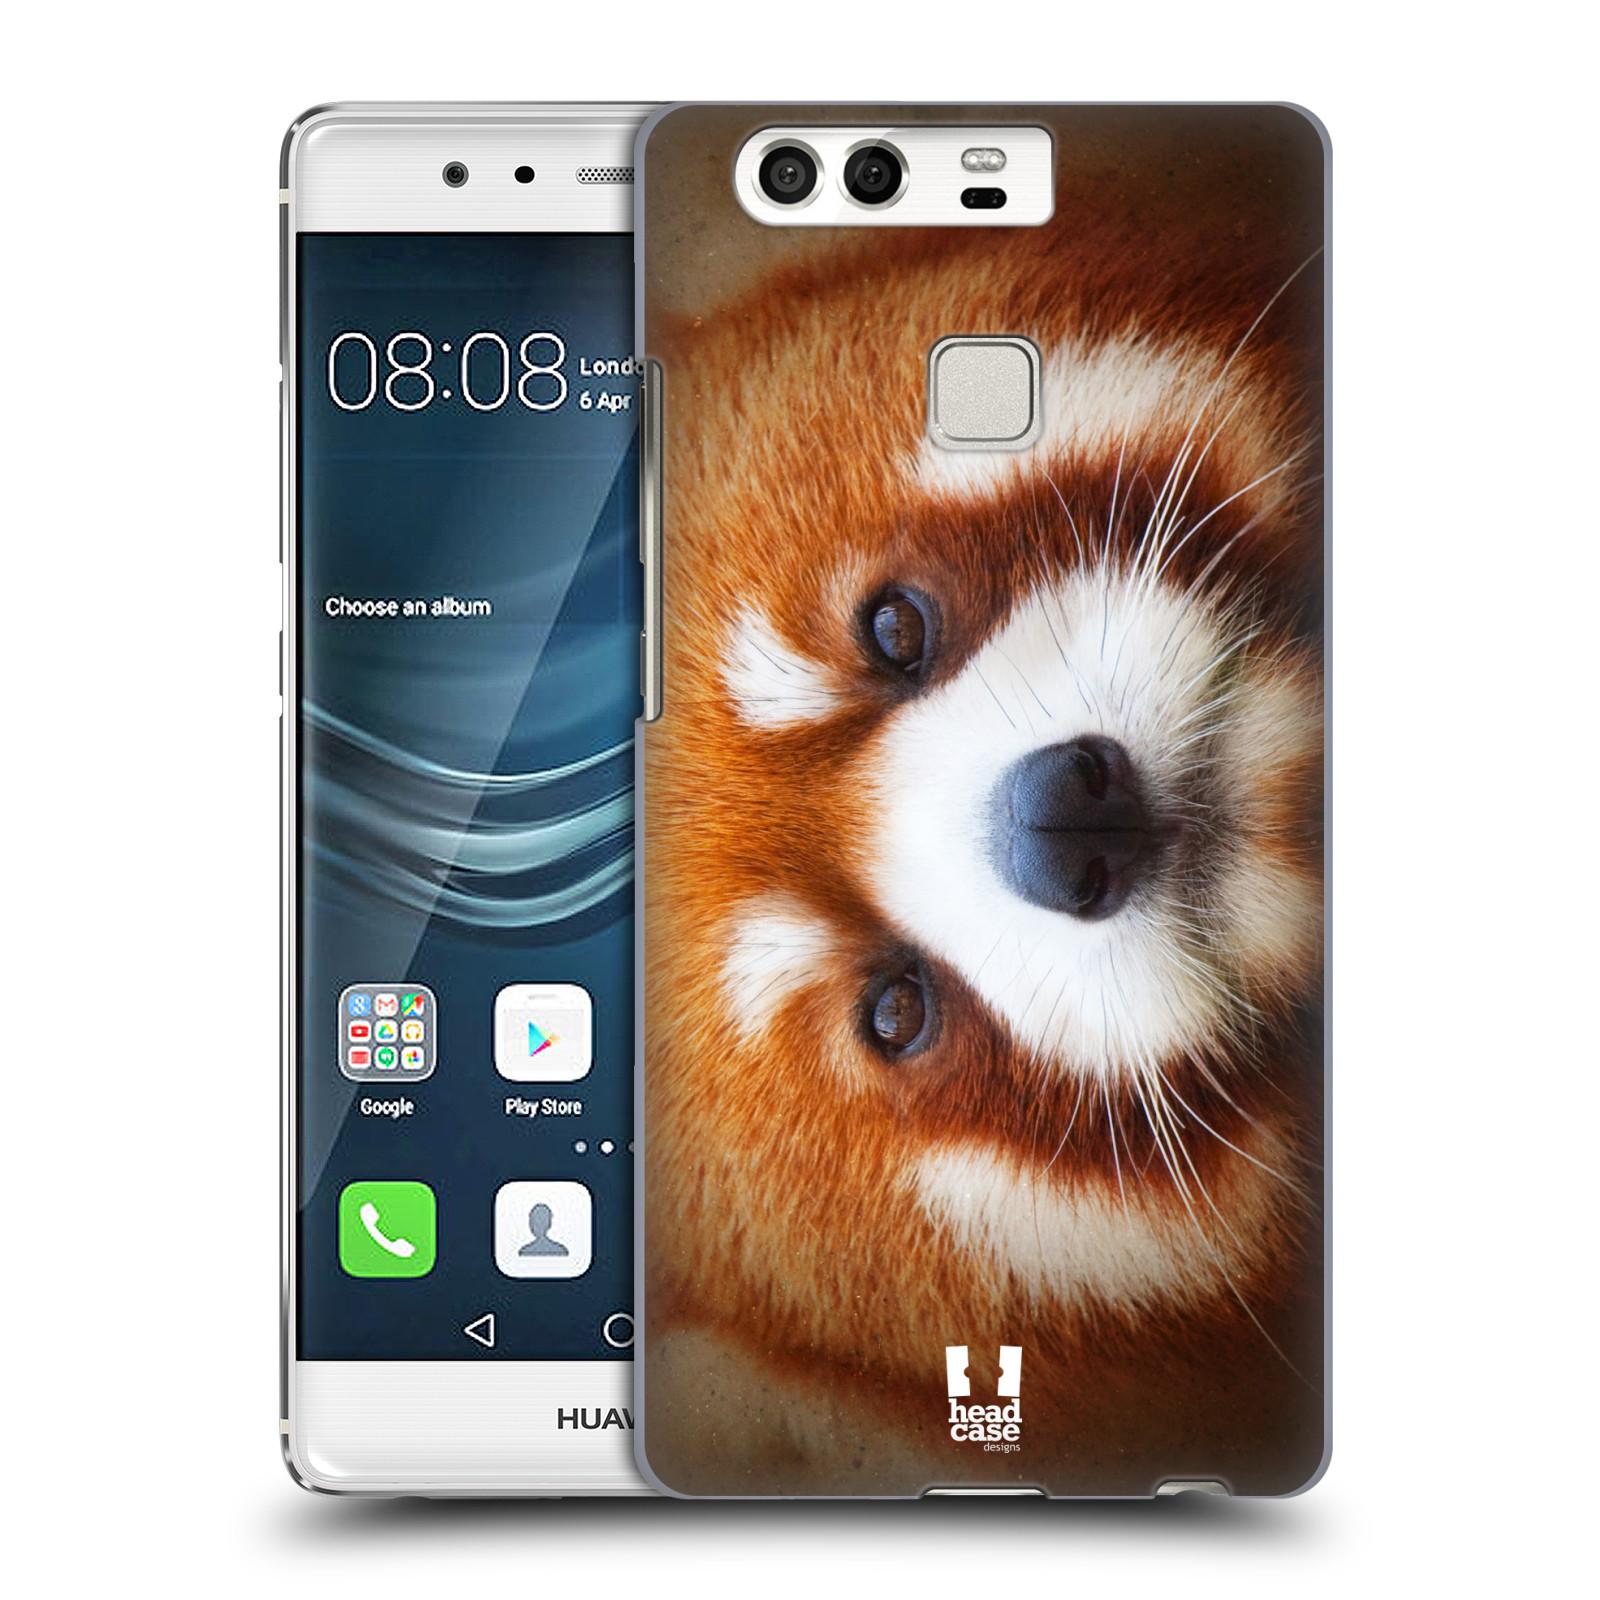 HEAD CASE plastový obal na mobil Huawei P9 / P9 DUAL SIM vzor Zvířecí tváře 2 medvěd panda rudá